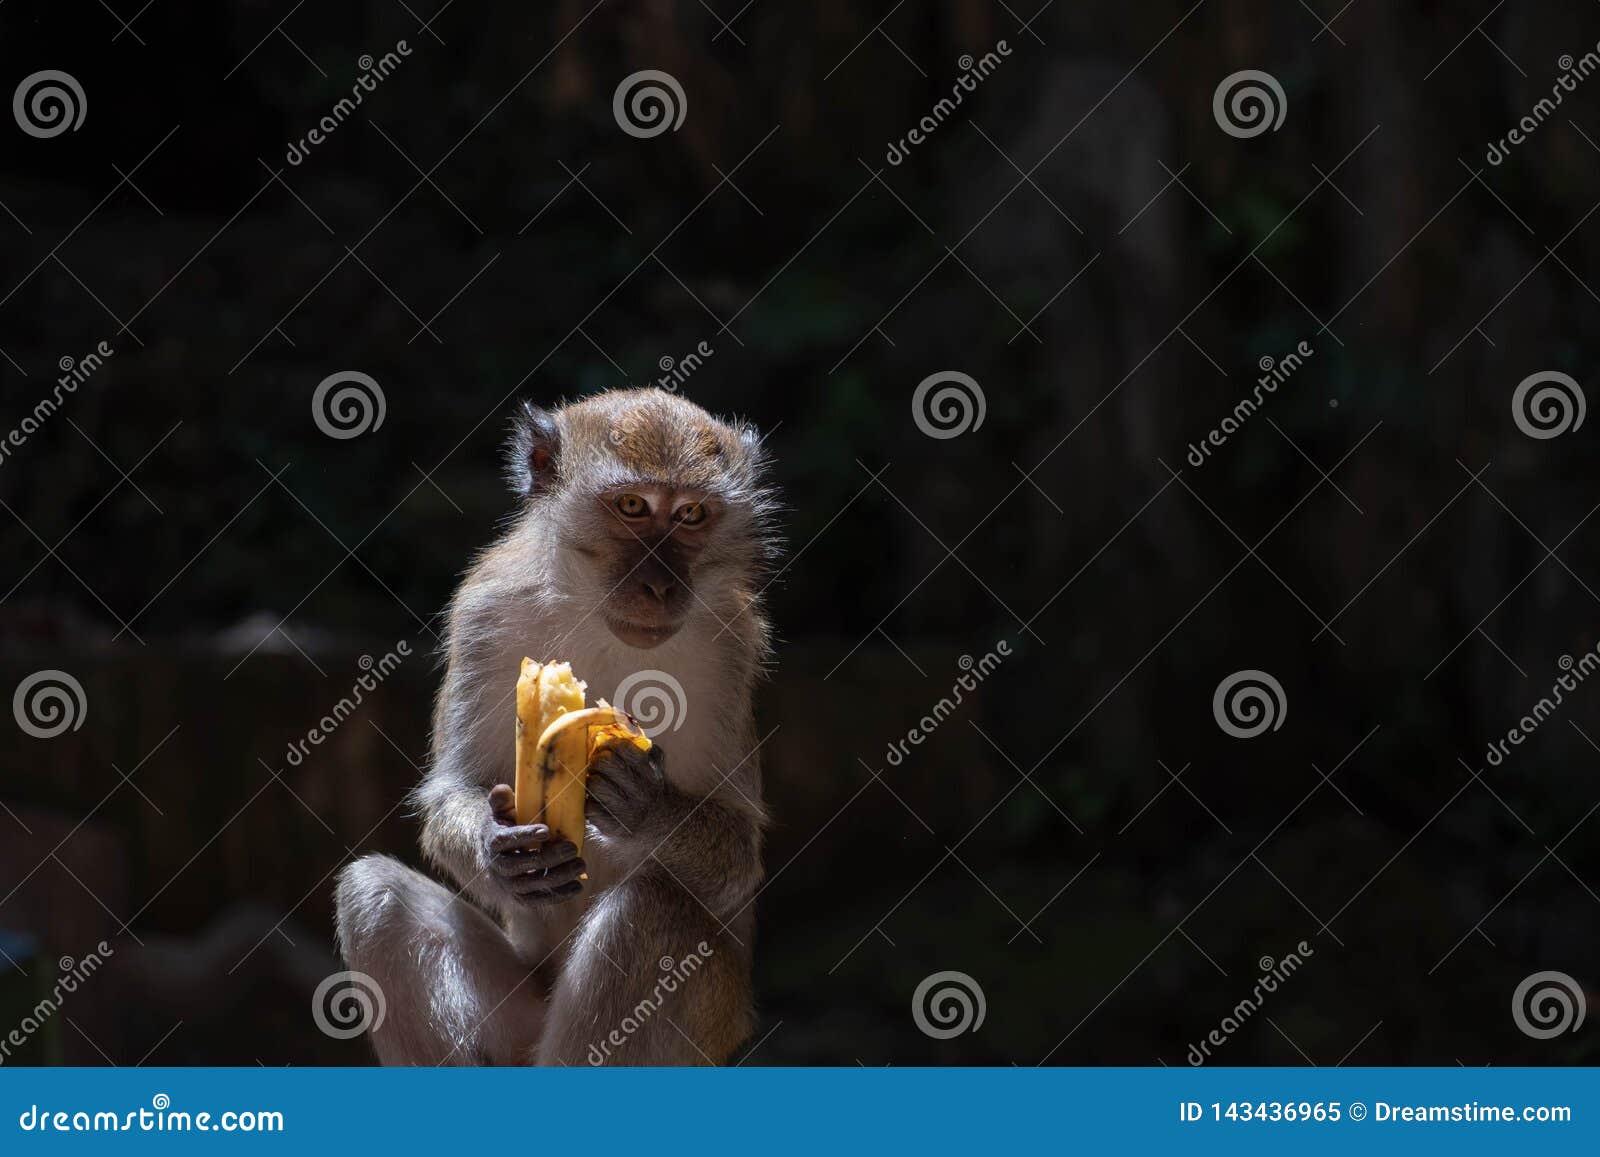 One hungry Monkey.